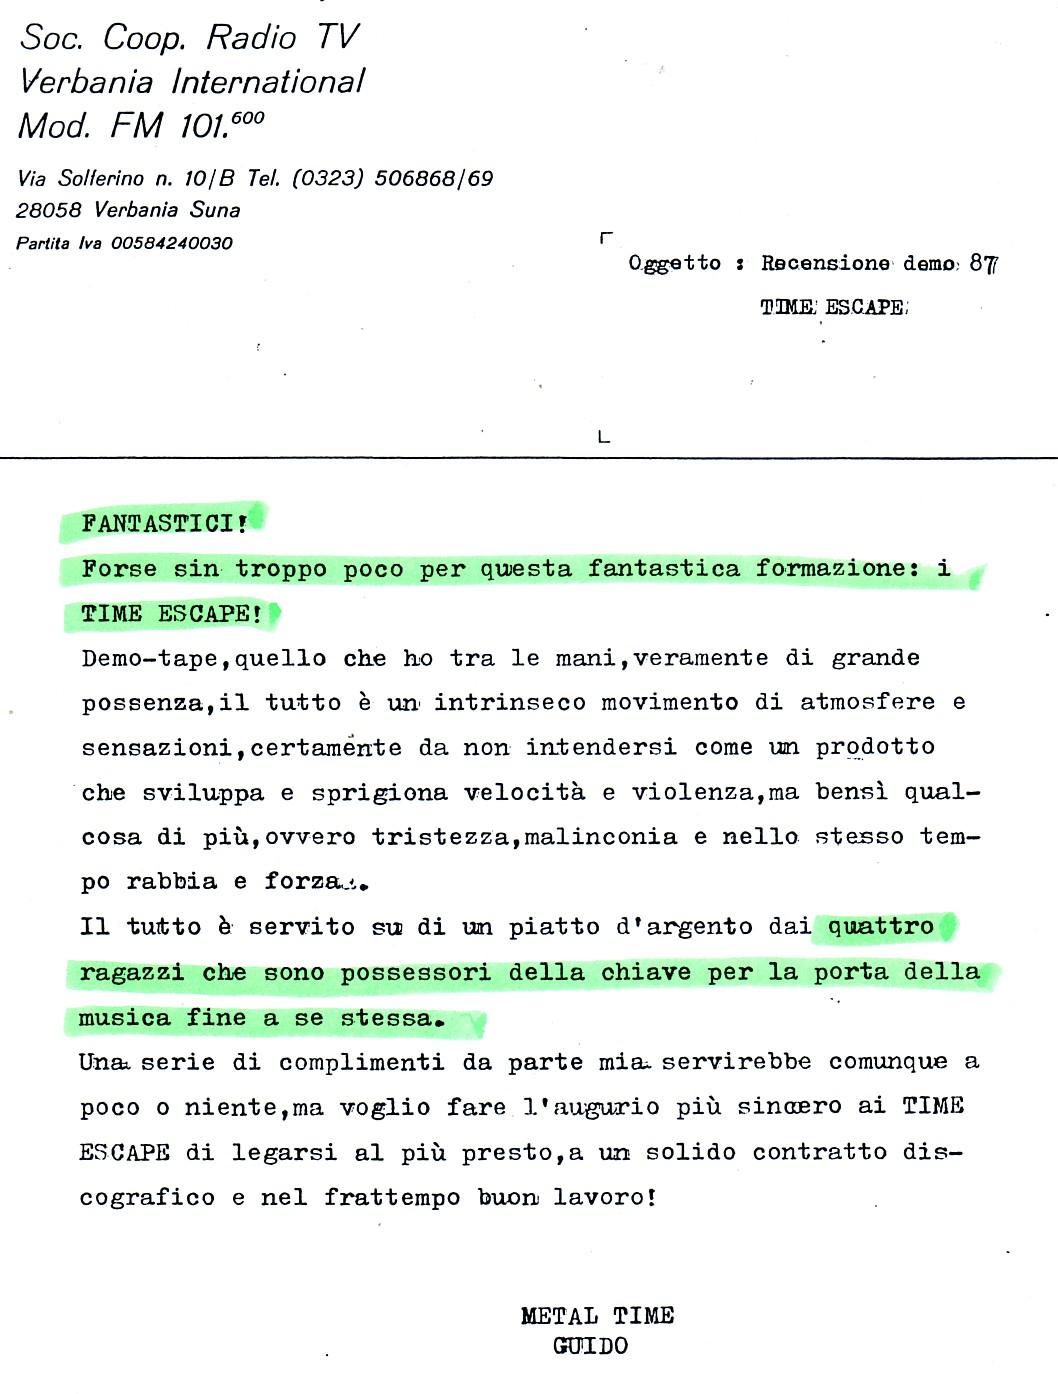 RADIO VERBANIA INTERNATIONAL (ITALY) - 1988